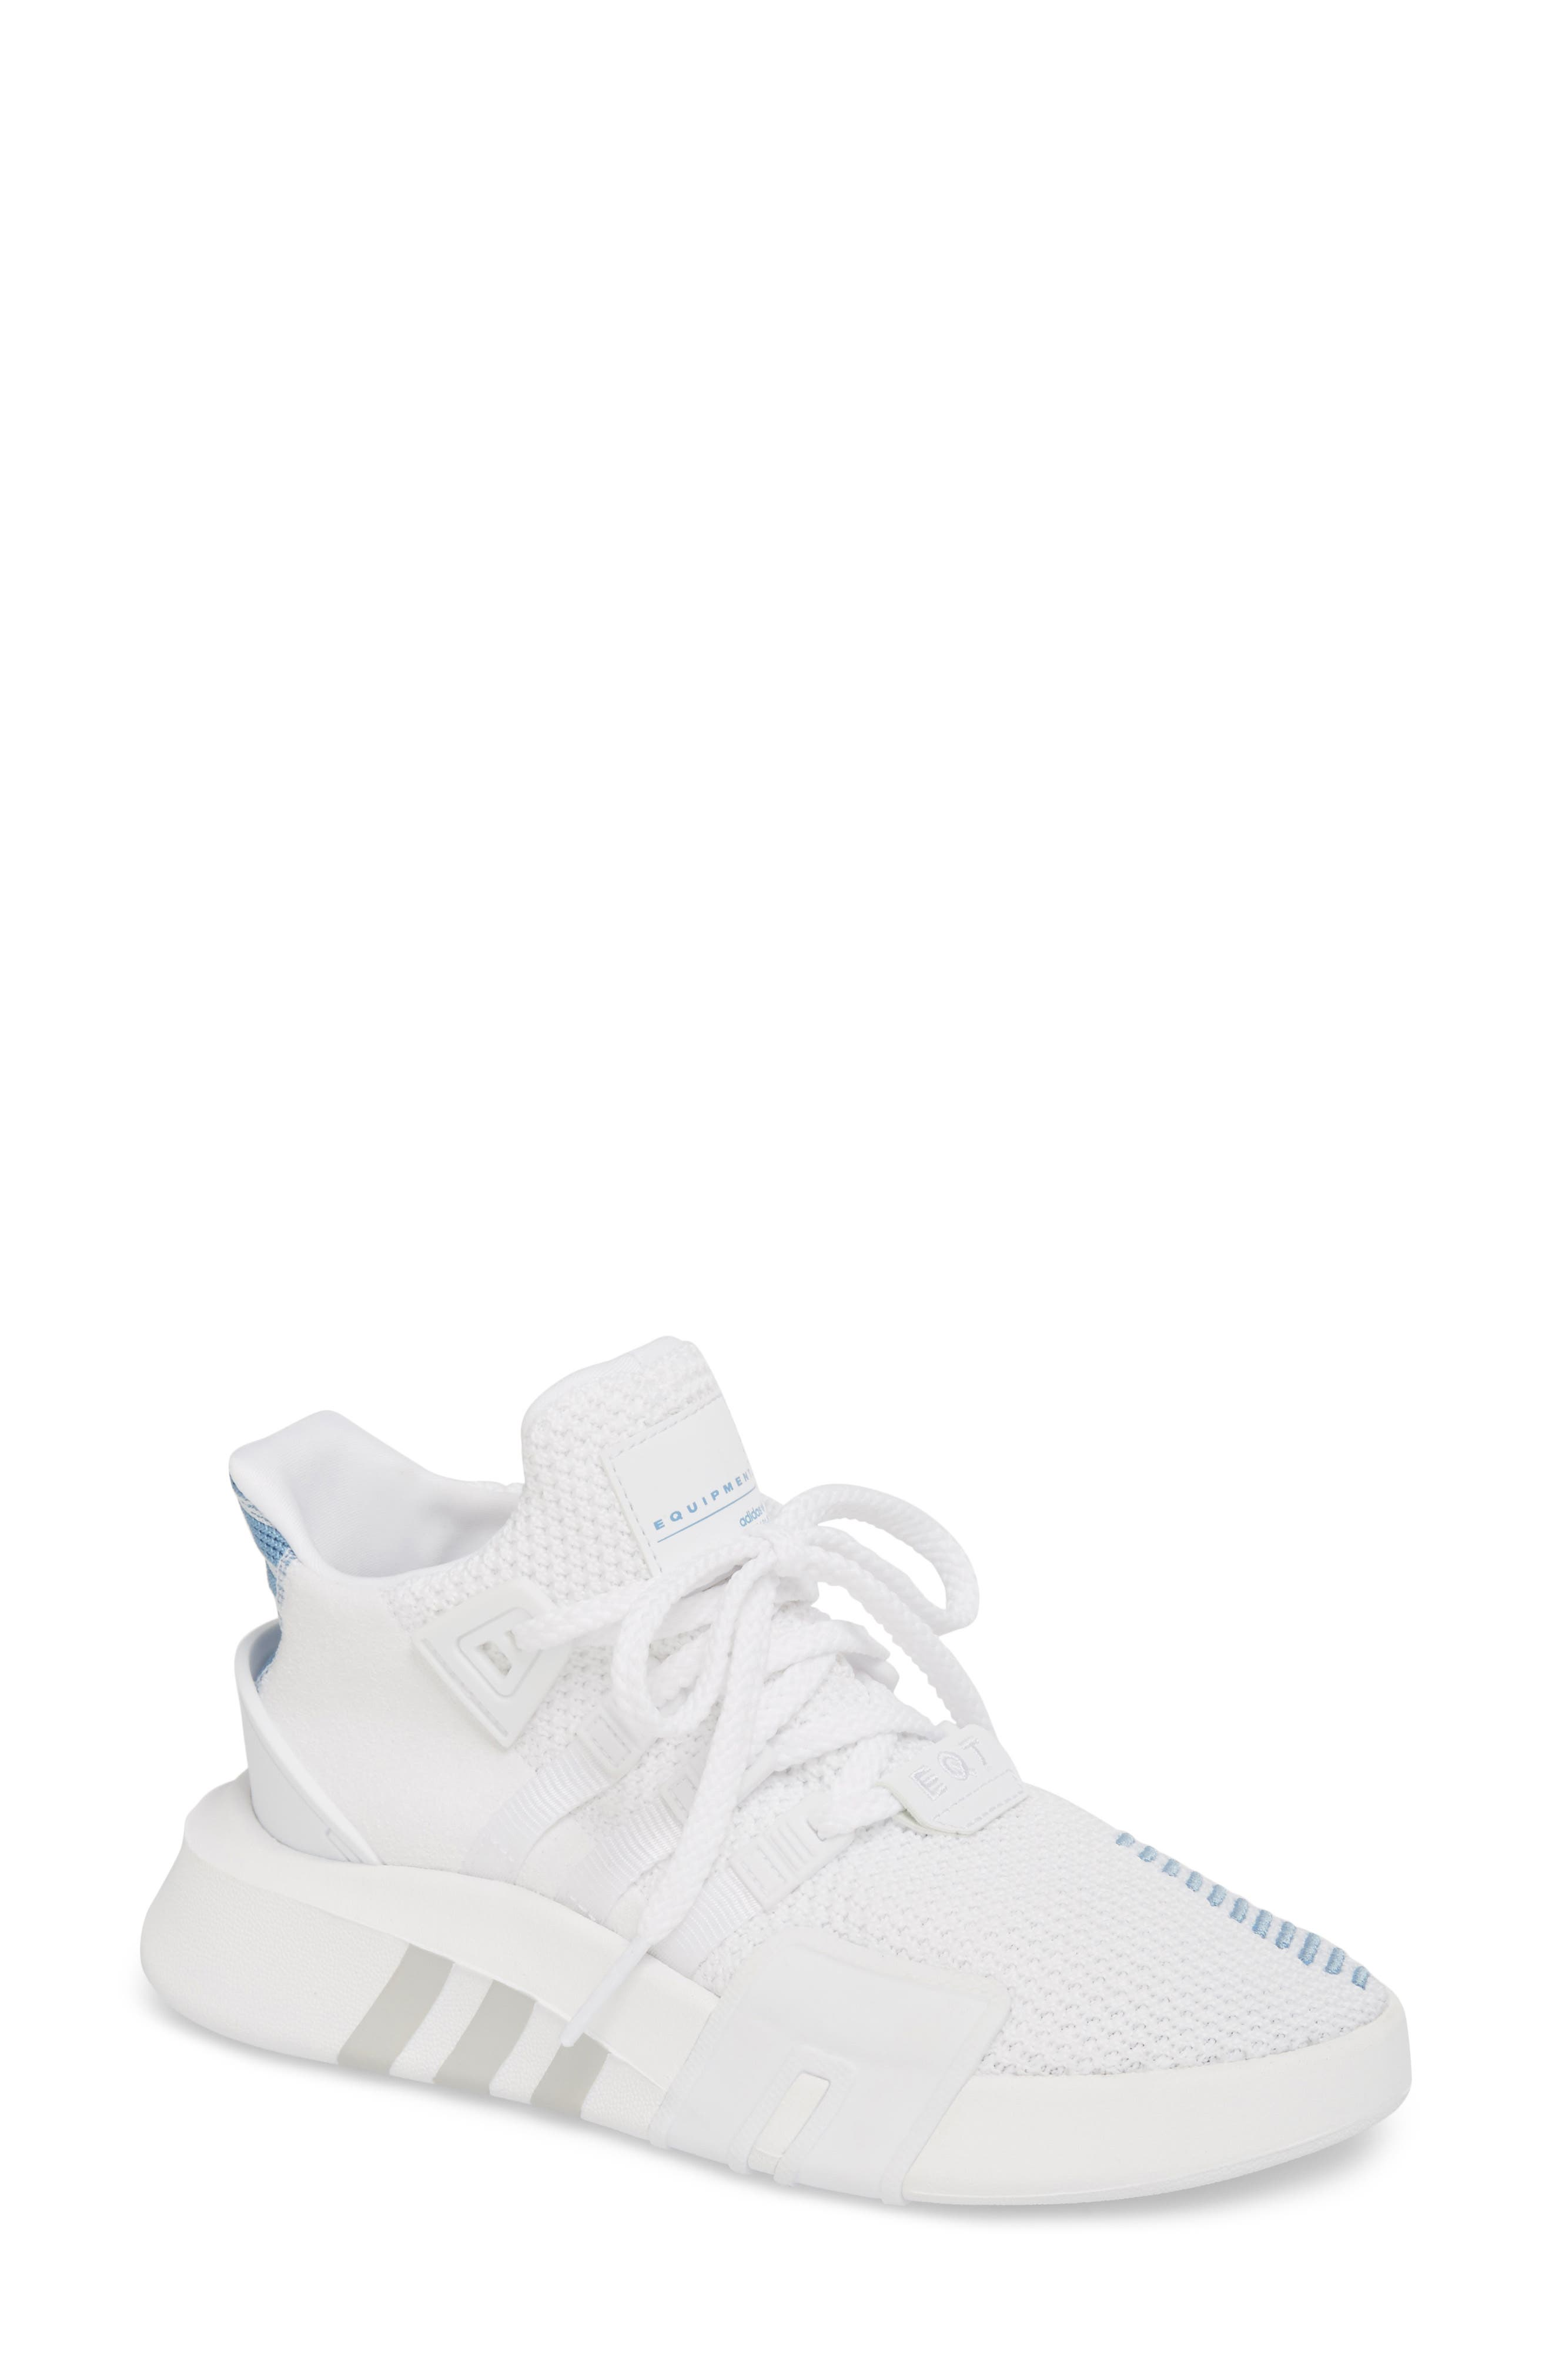 EQT Basketball ADV Sneaker,                             Main thumbnail 1, color,                             White/ White/ Ash Blue